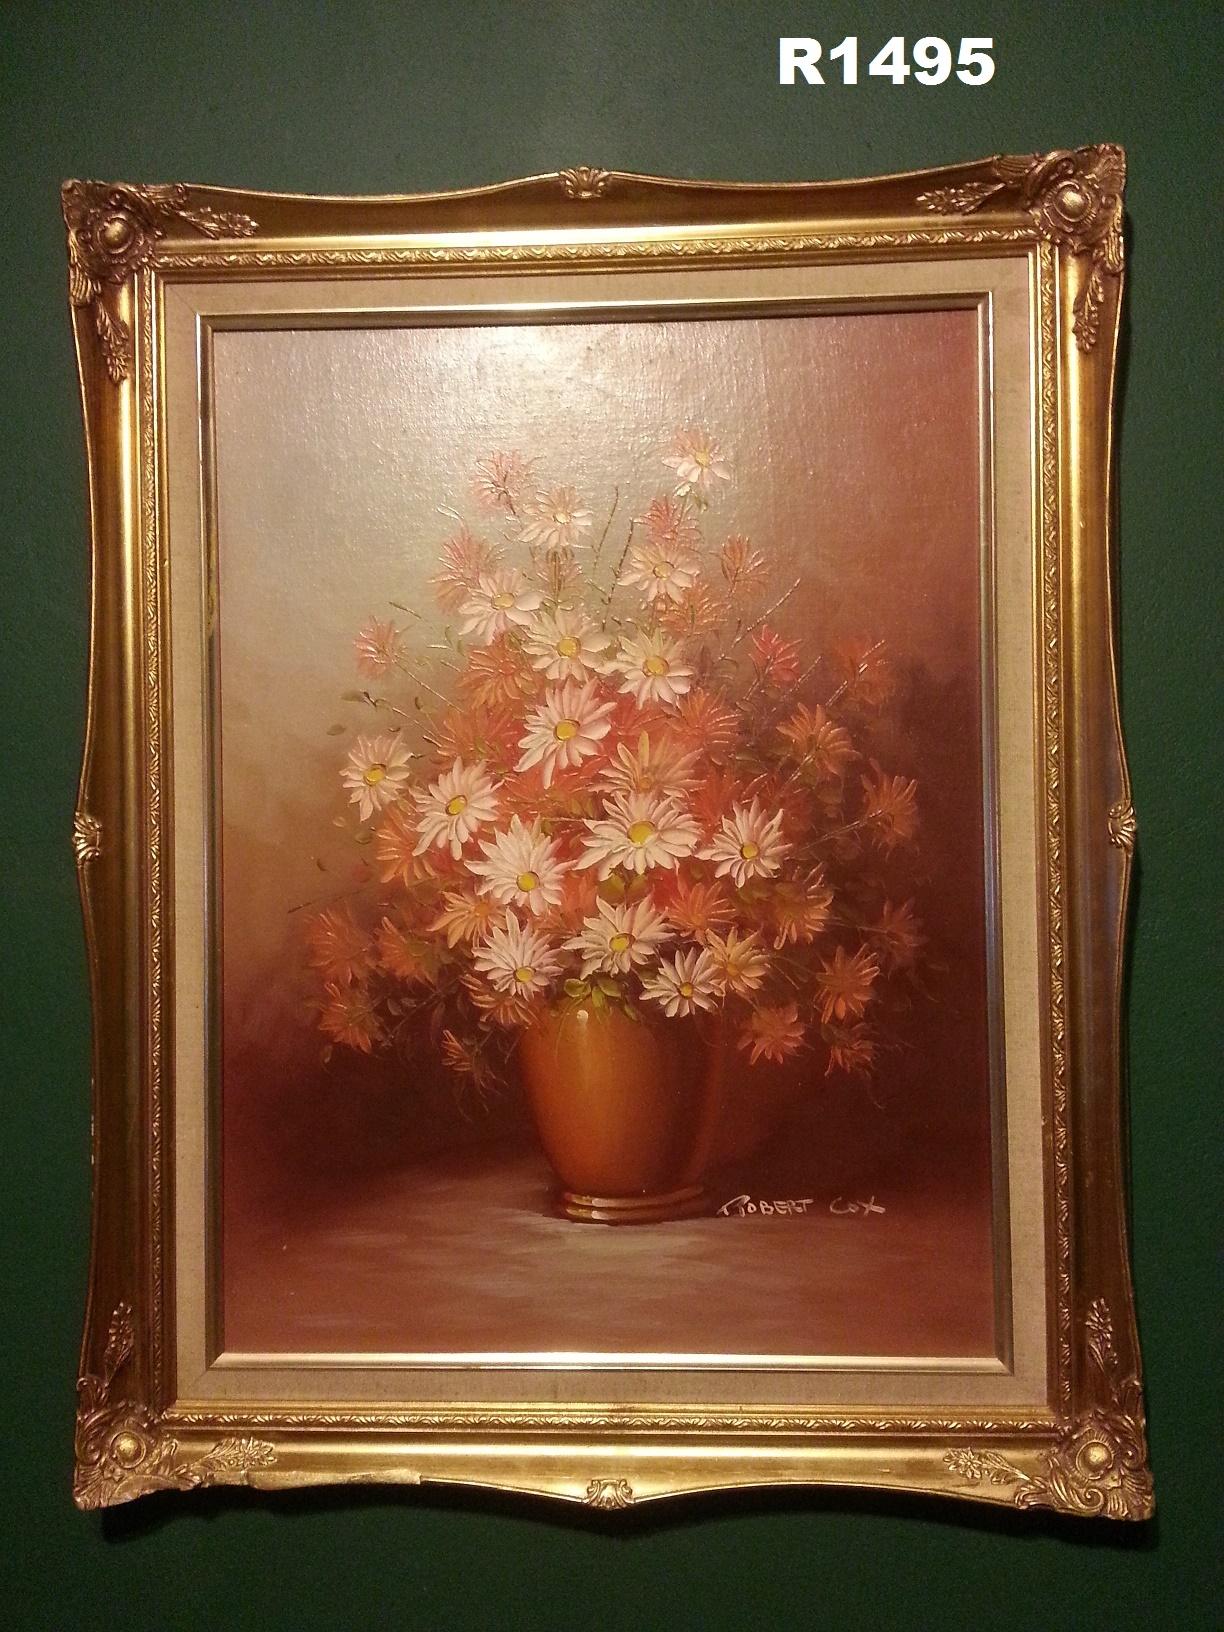 Robert Cox Oil Painting (595x745)